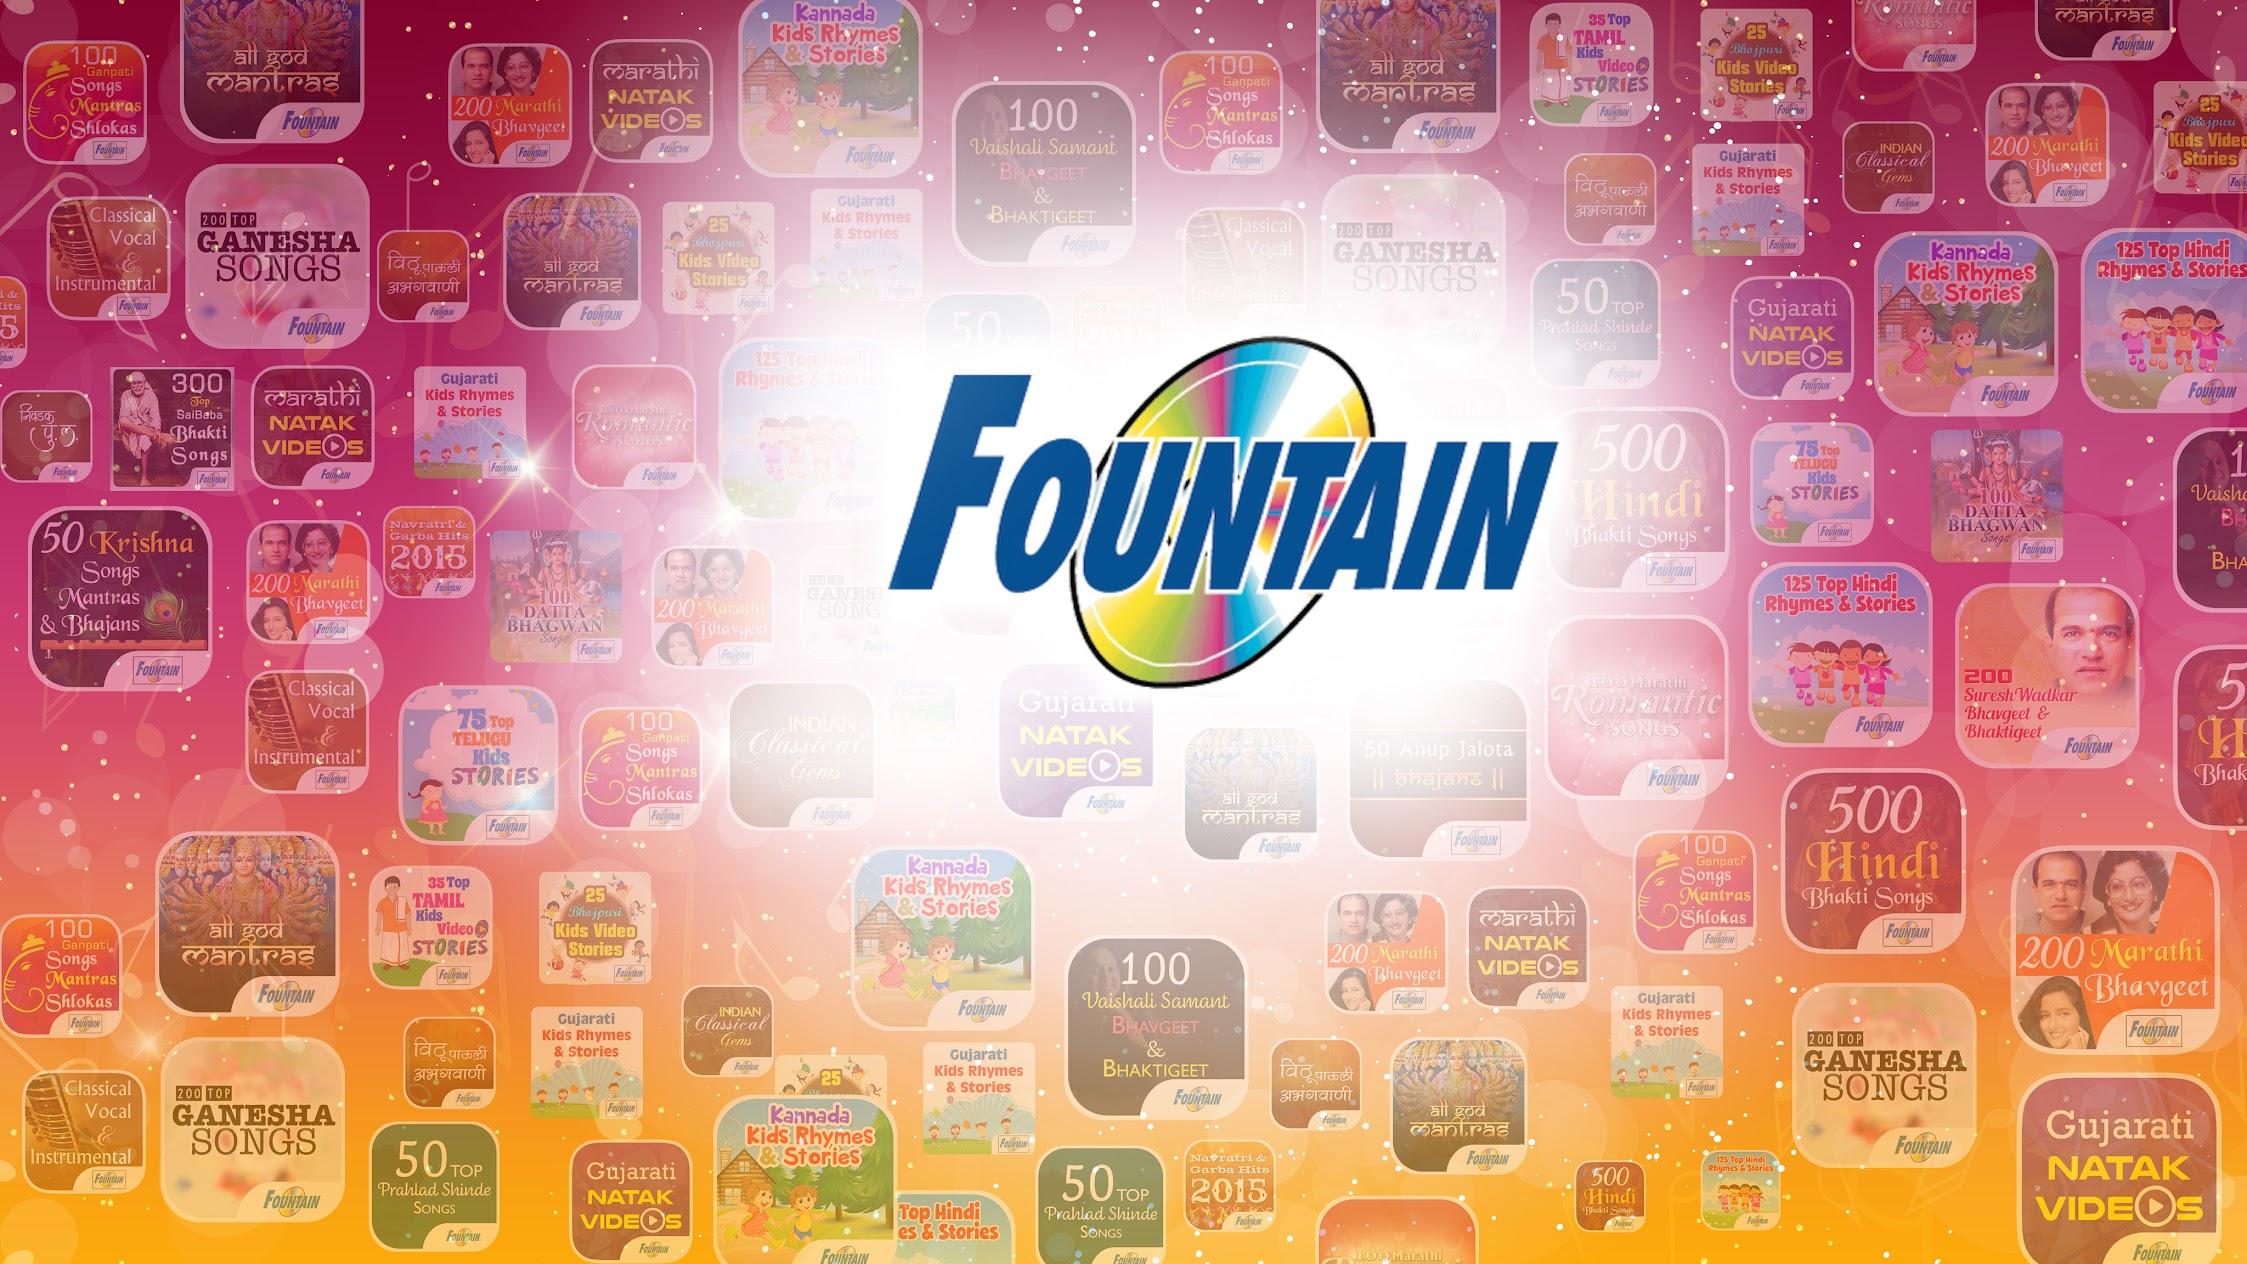 Fountain Music Company